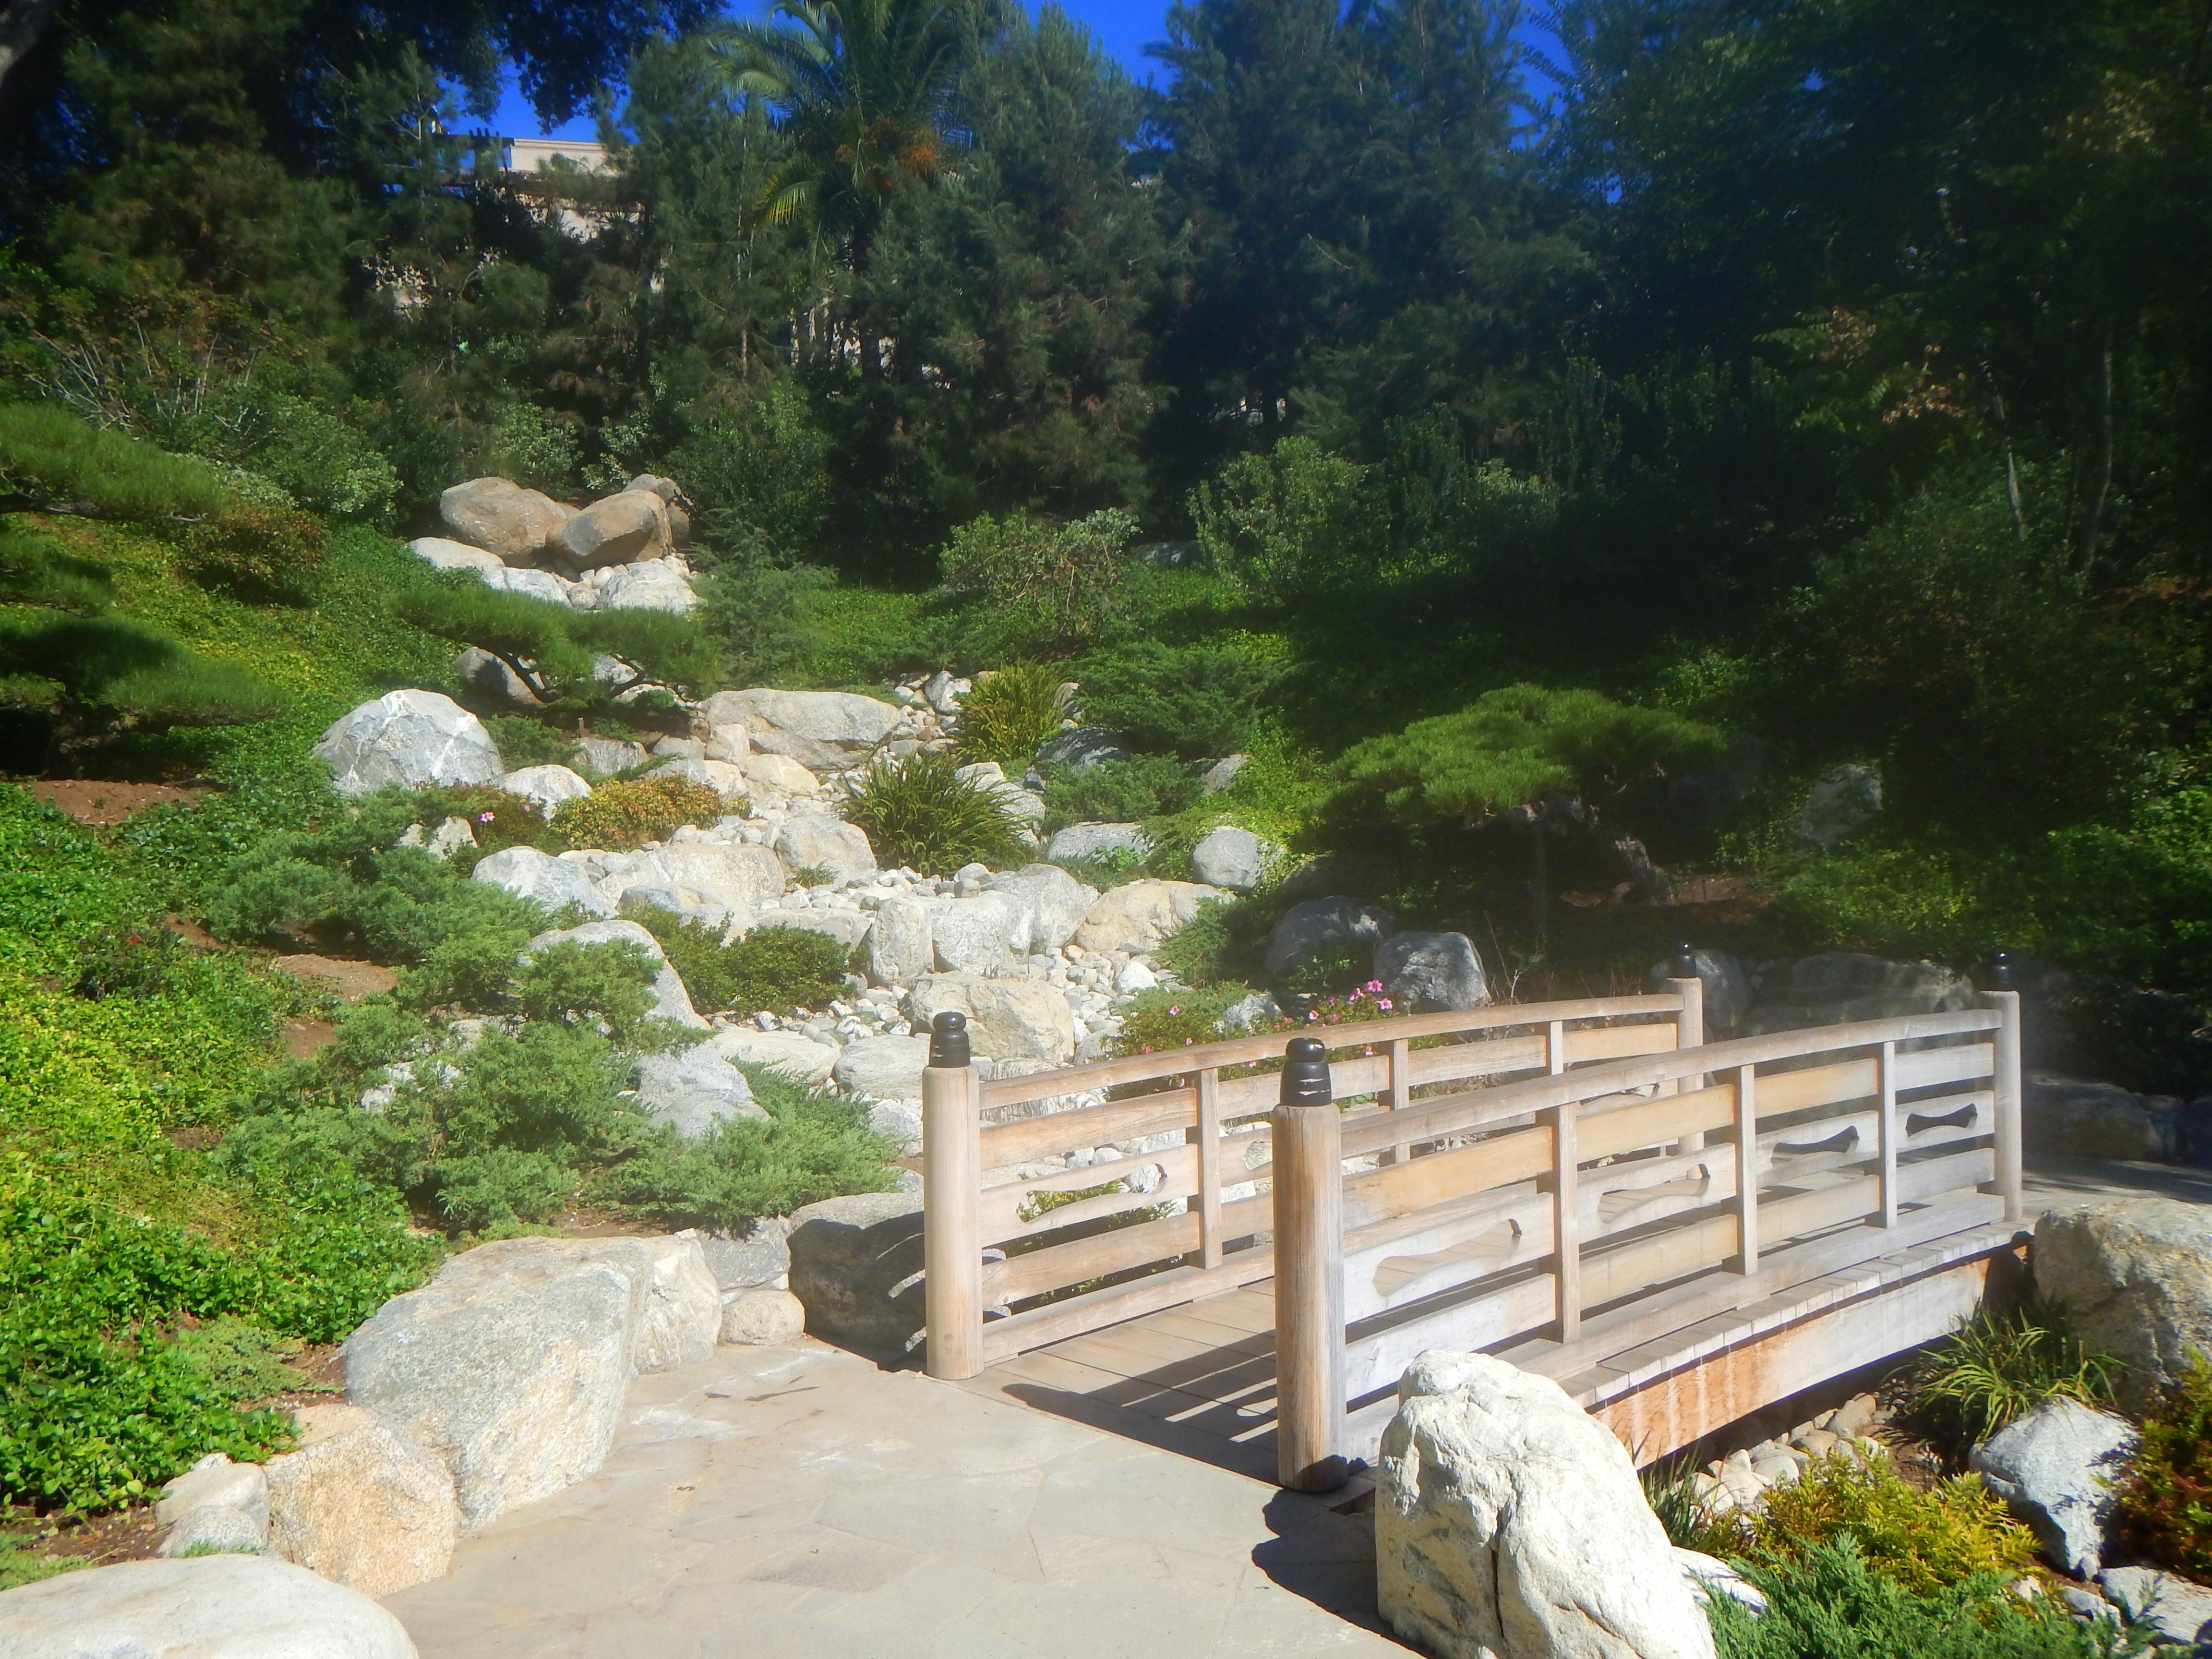 San Diego Part 4 The Outdoor Gardens Of Balboa Park